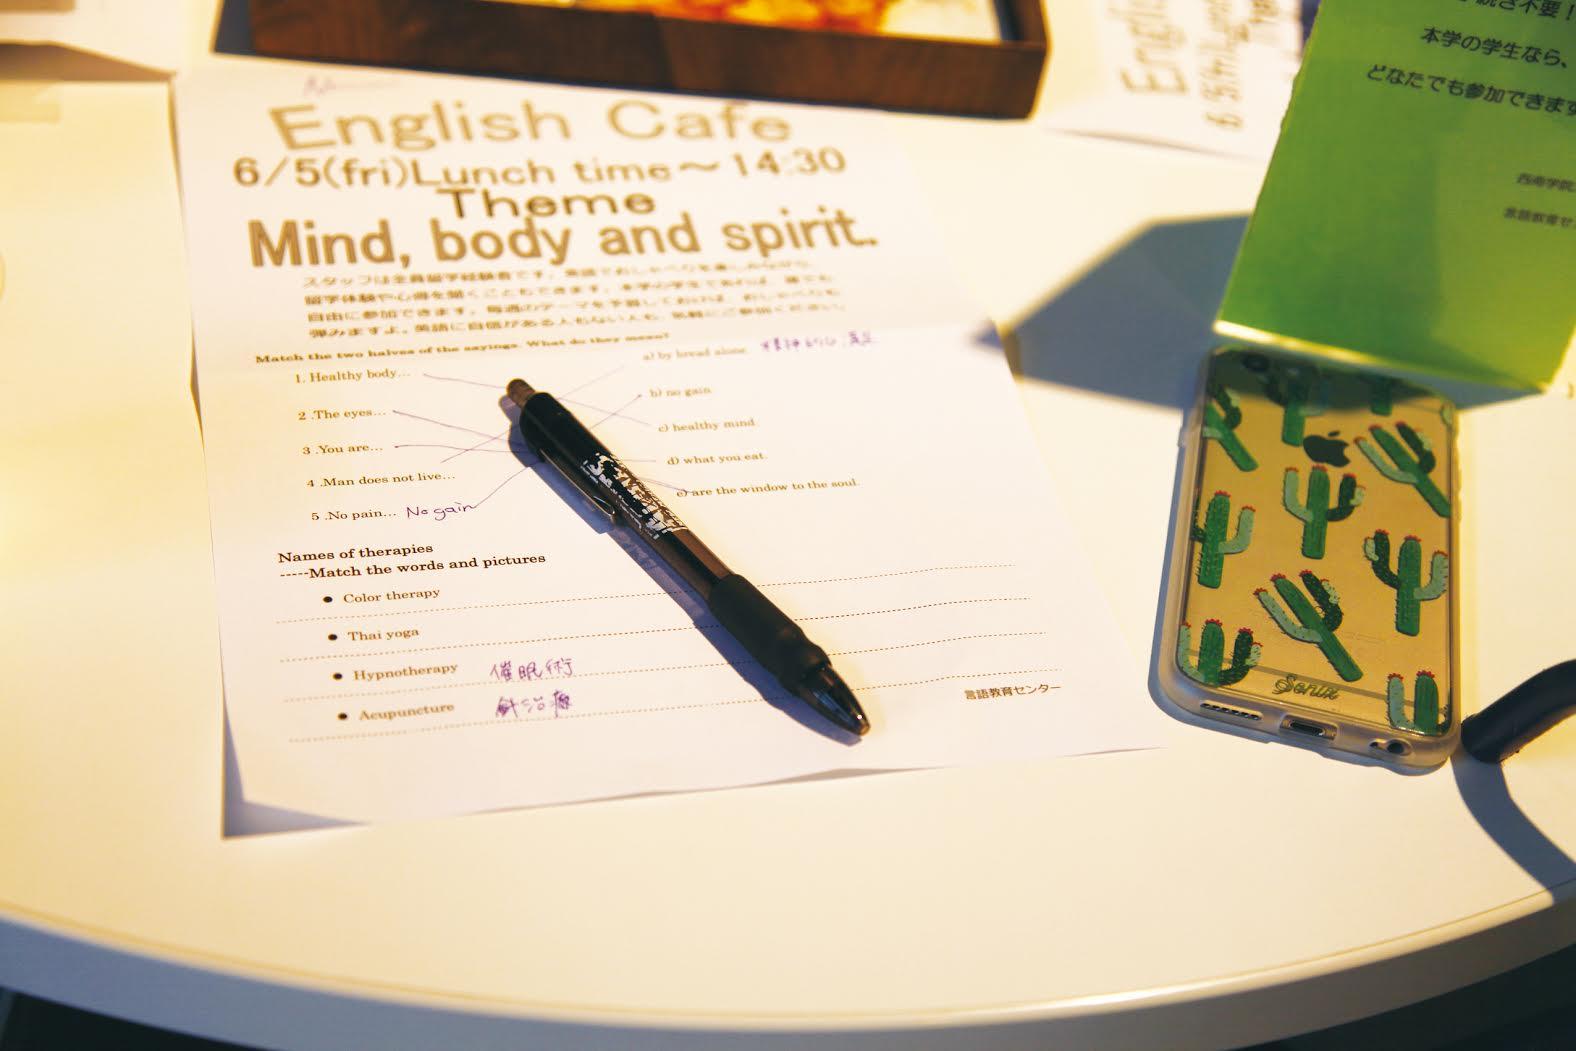 englishcafe